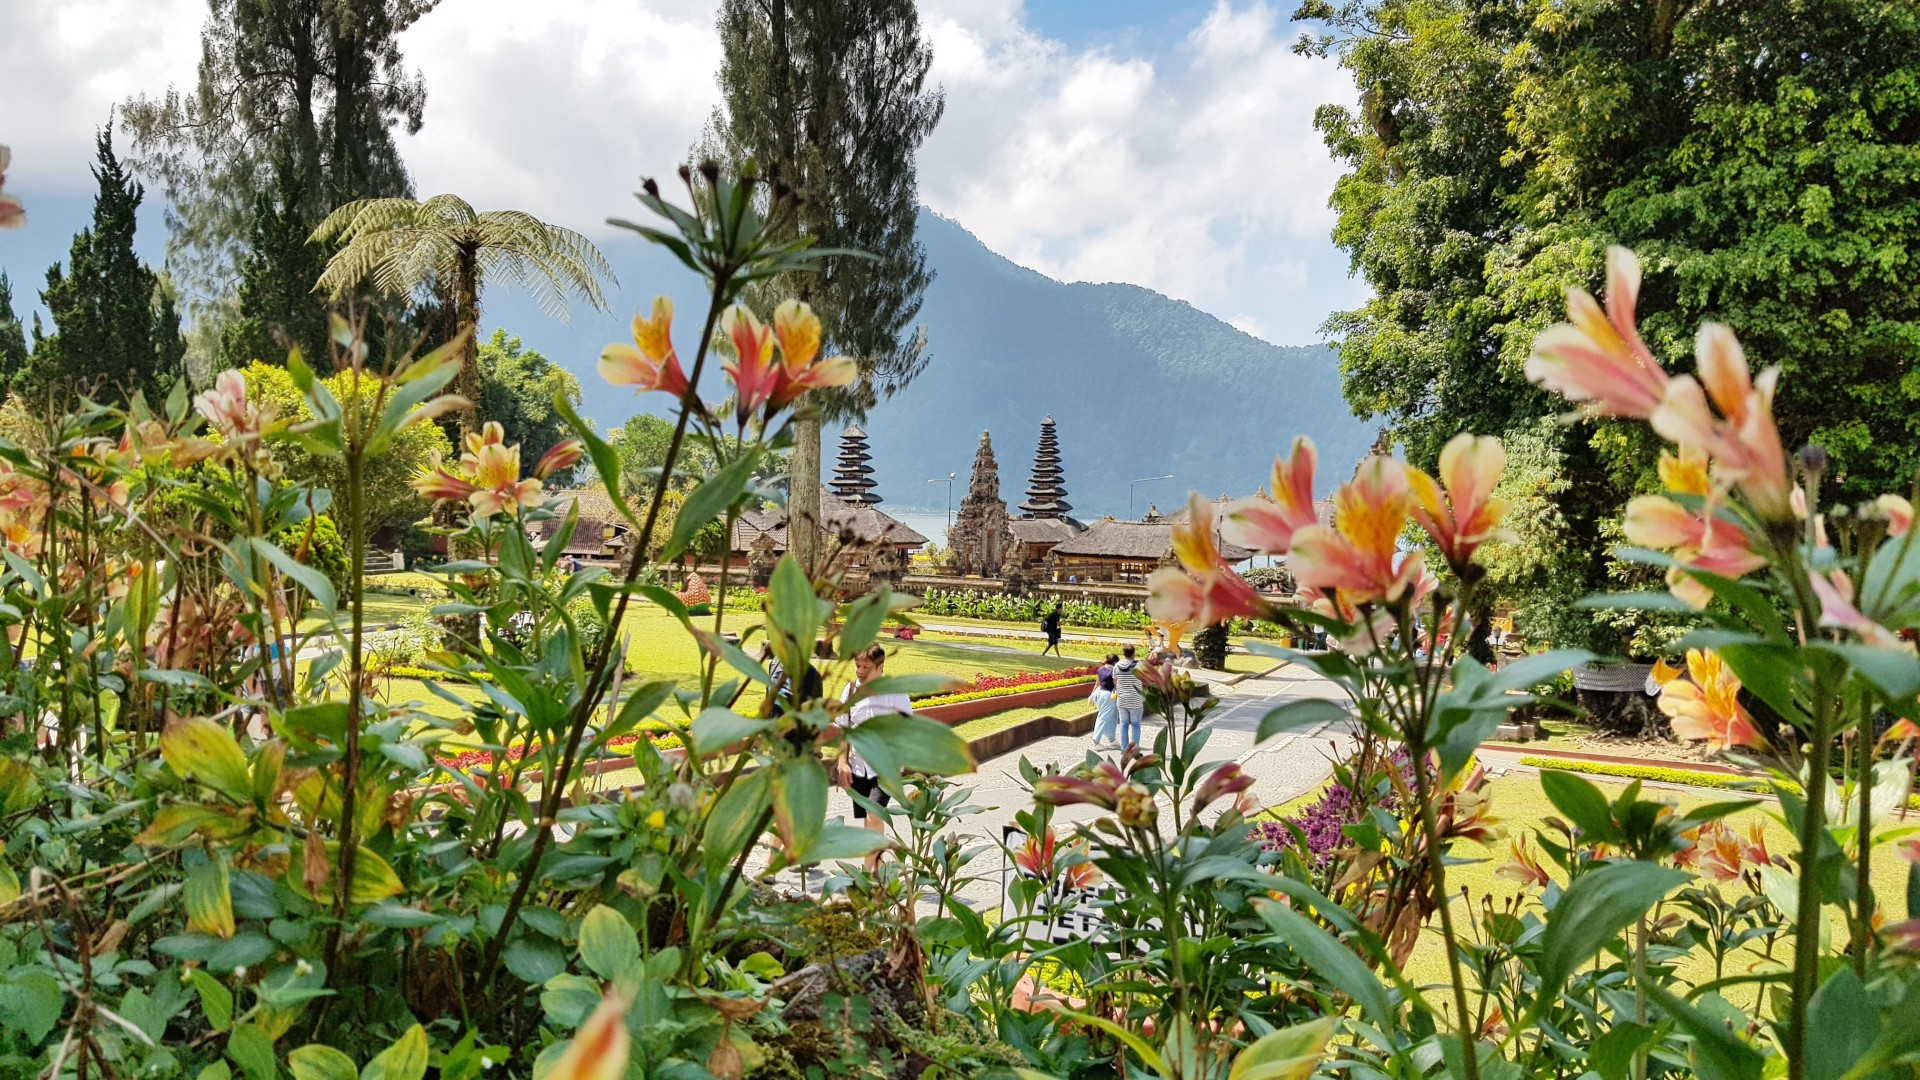 Озеро Братан и главный «водный» храм Бали — Пура Улун Дану